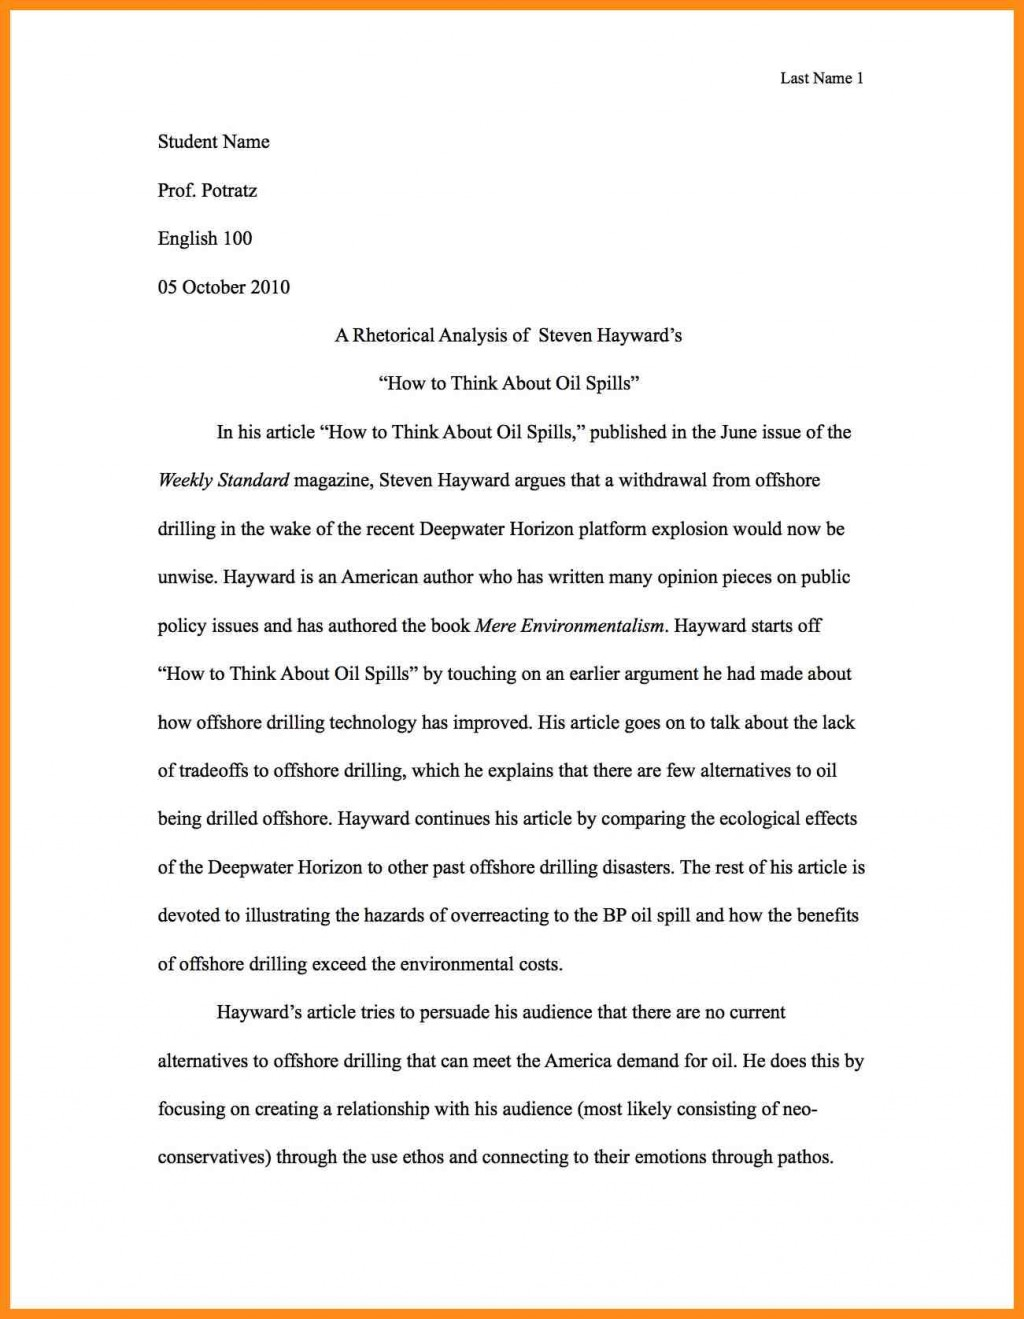 001 Essay Example Write Best Rhetorical Analysis Of Using Ethos Pathos And Logos Breathtaking Outline Sample Ap Lang Topics 2016 Large